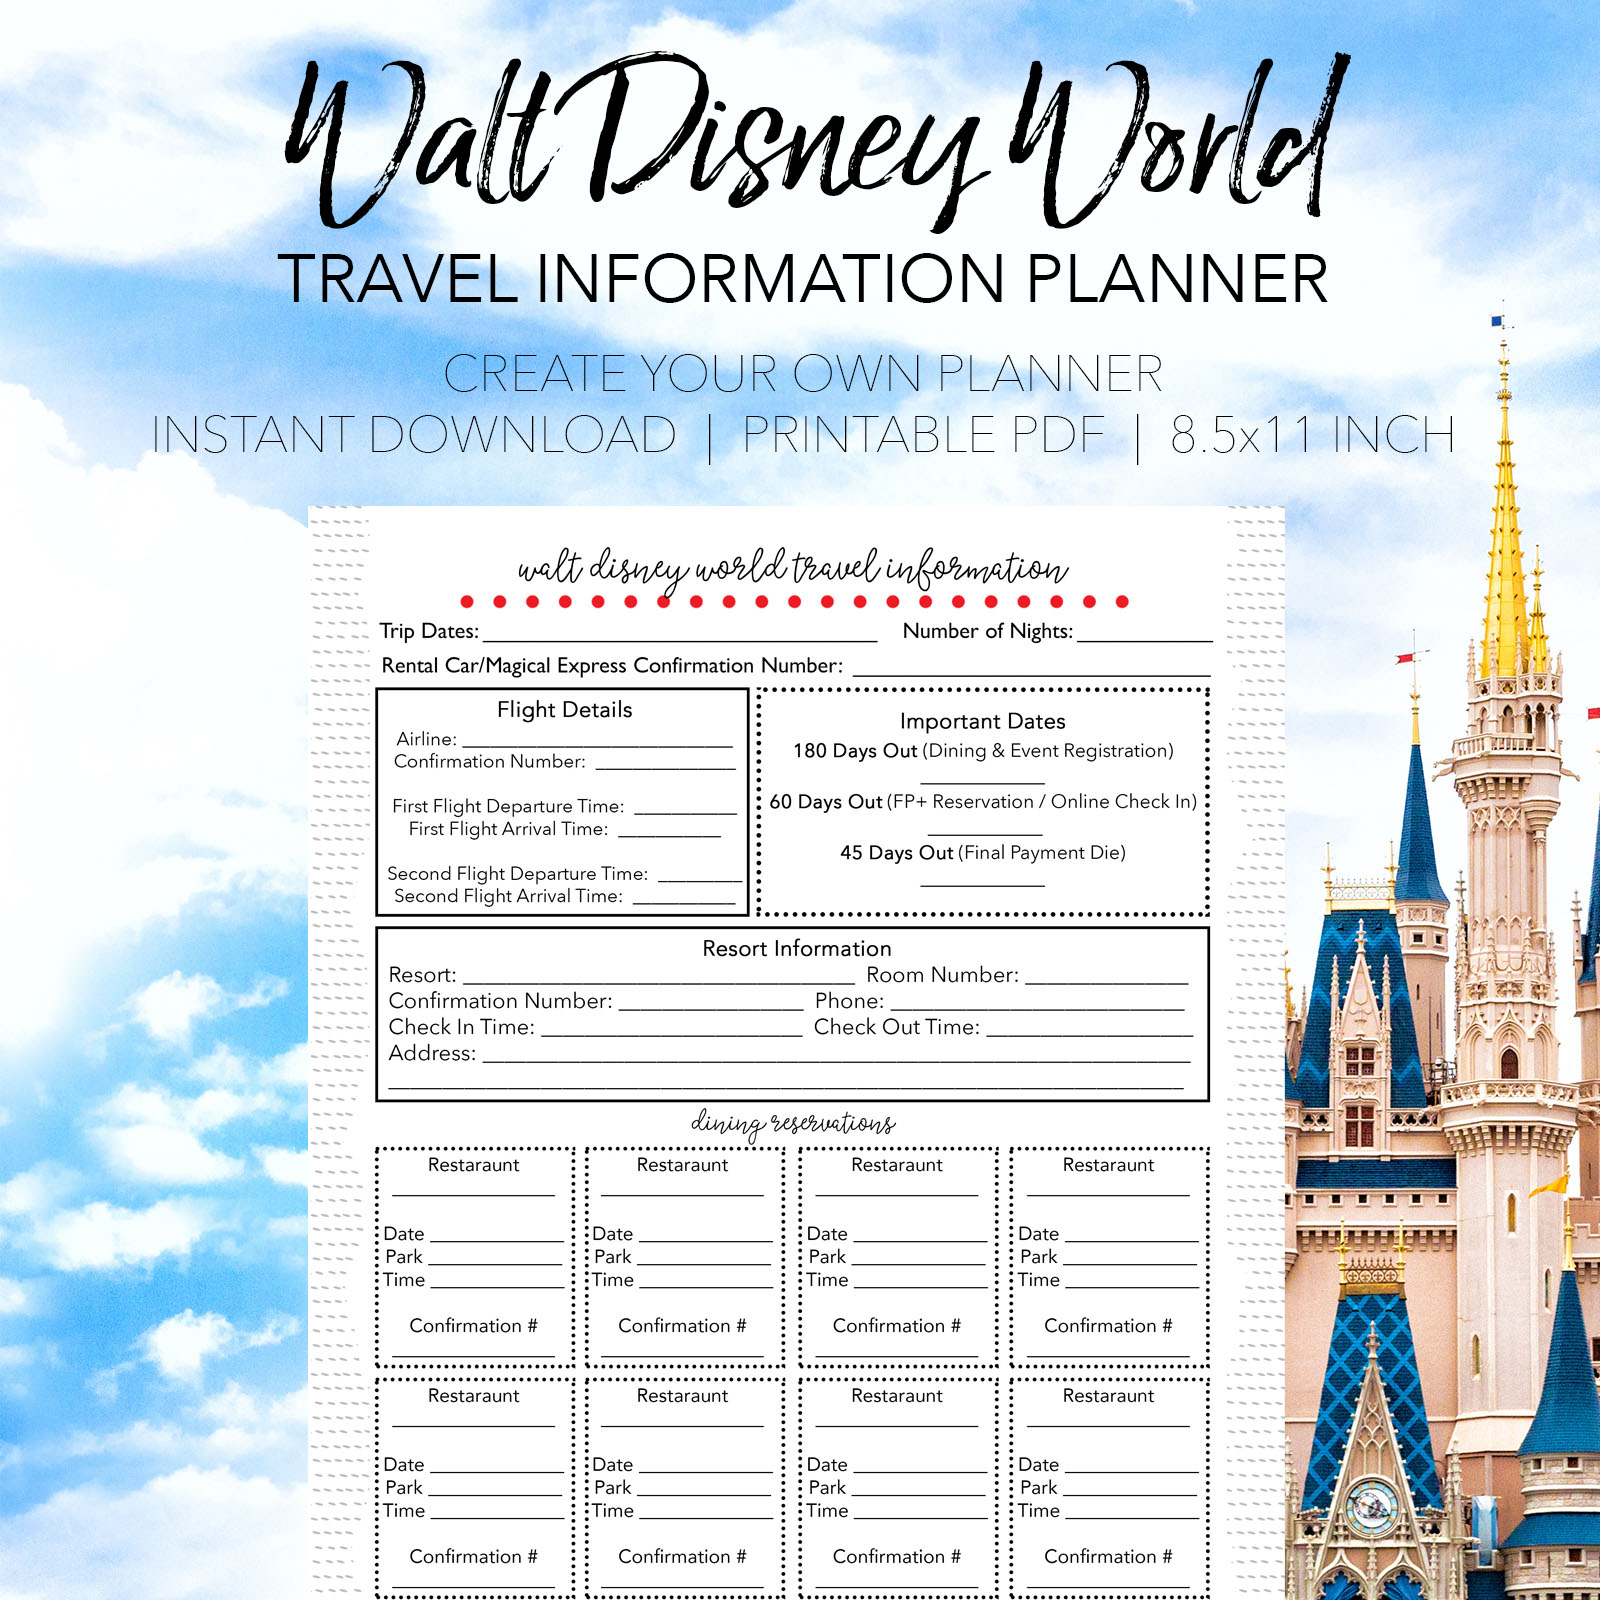 Walt Disney World Travel Info Planner